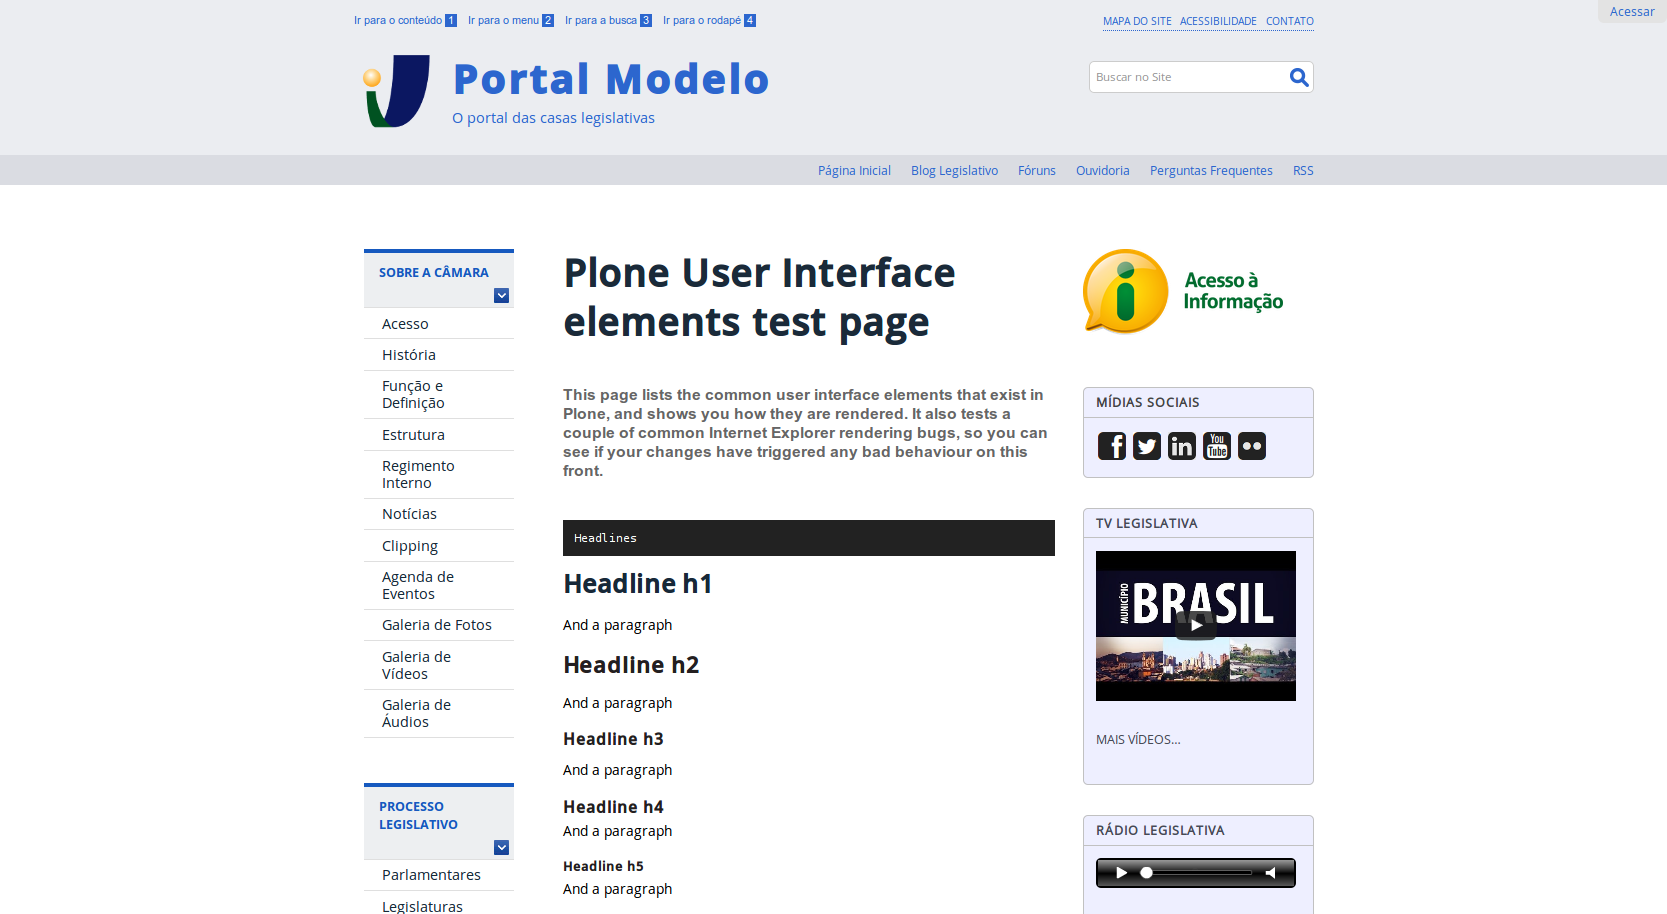 https://raw.githubusercontent.com/interlegis/interlegis.portalmodelo.theme/master/src/interlegis/portalmodelo/theme/themes/IDG-branco/preview.png